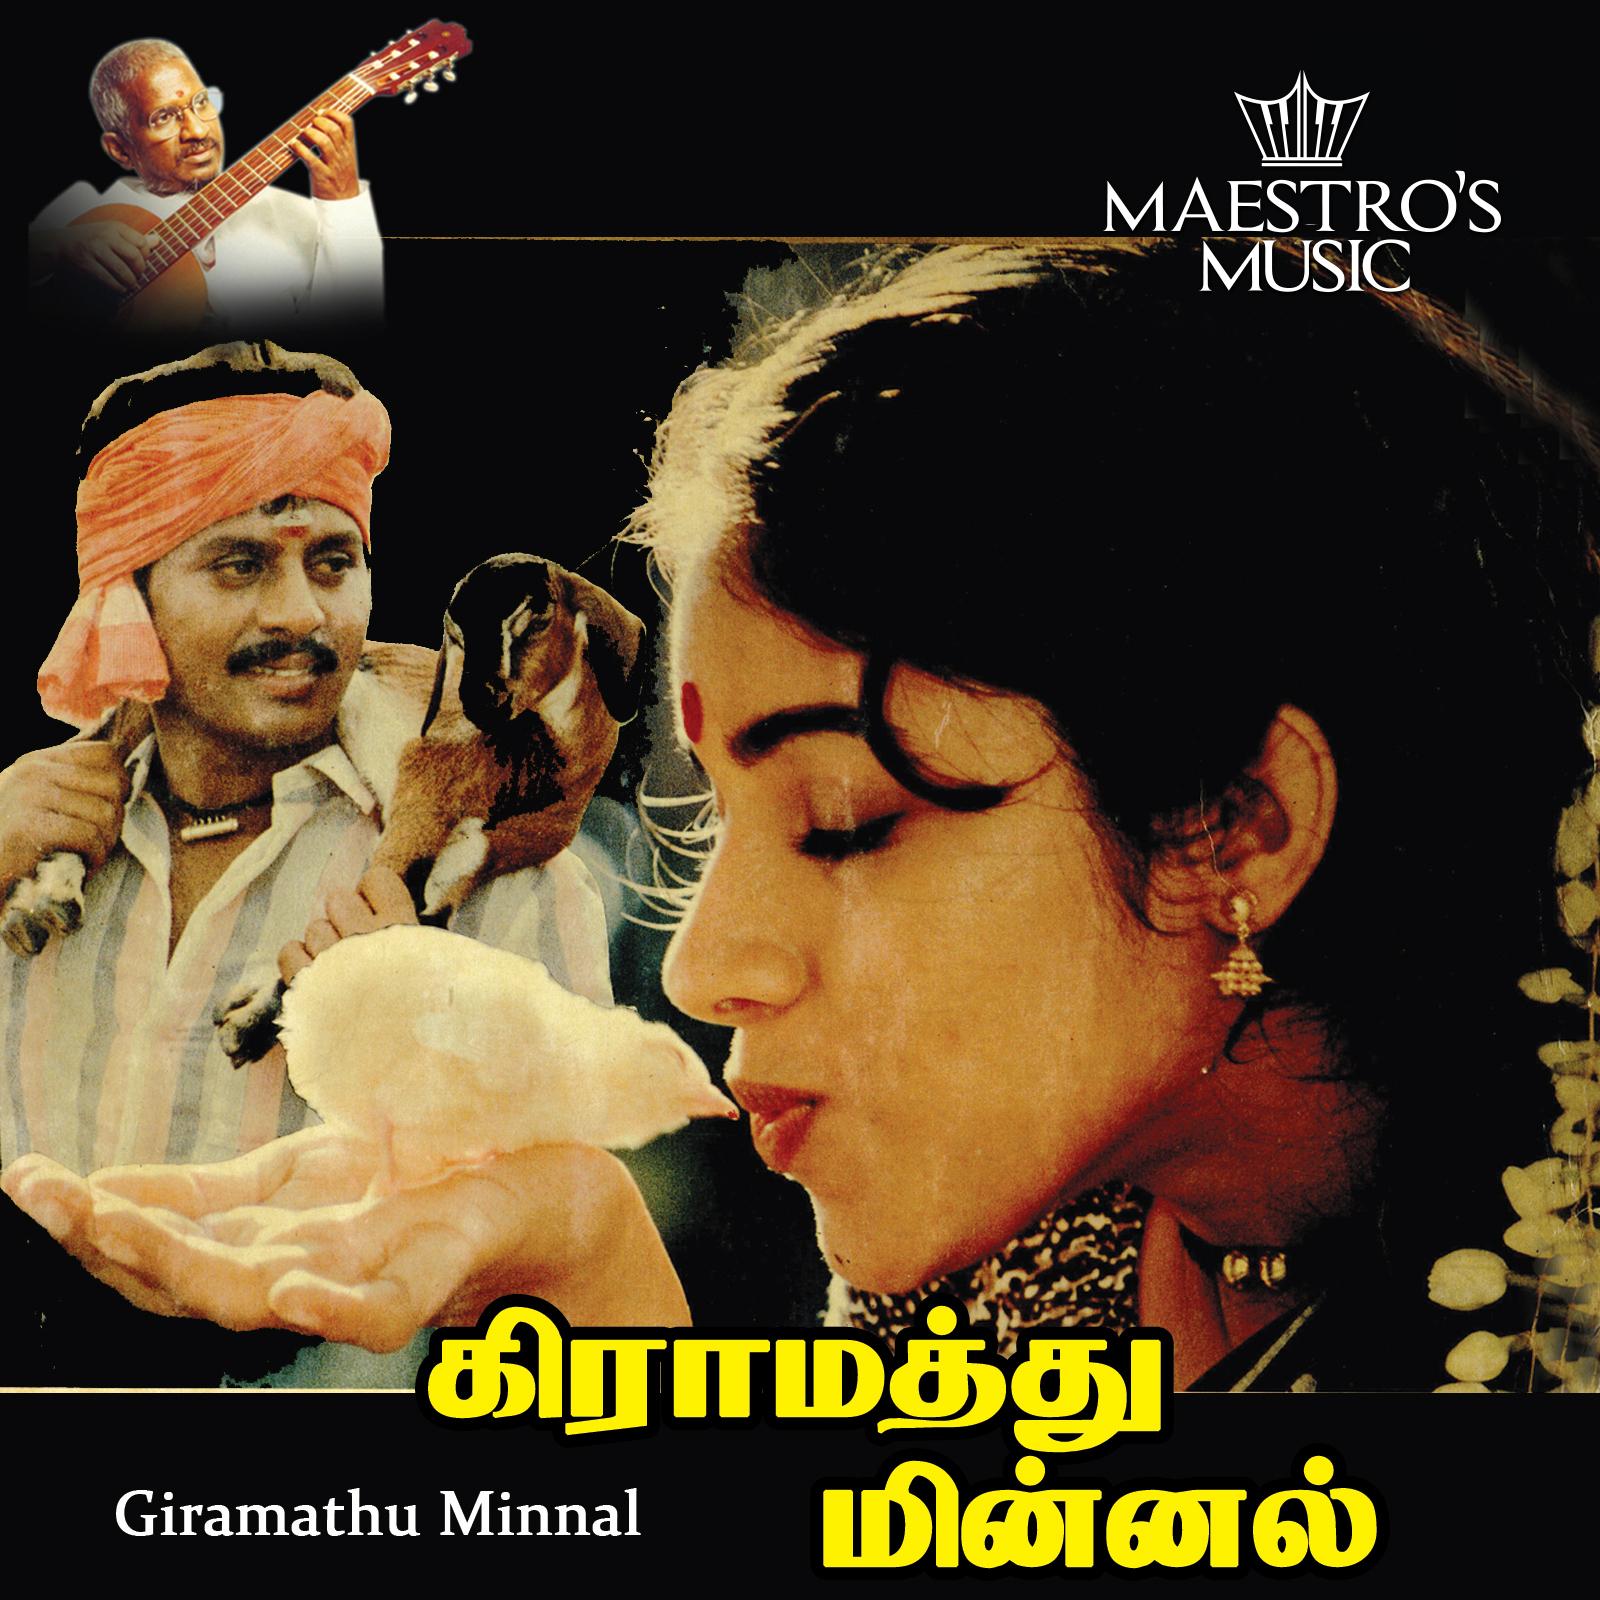 Graamathu Minnal ((1987))